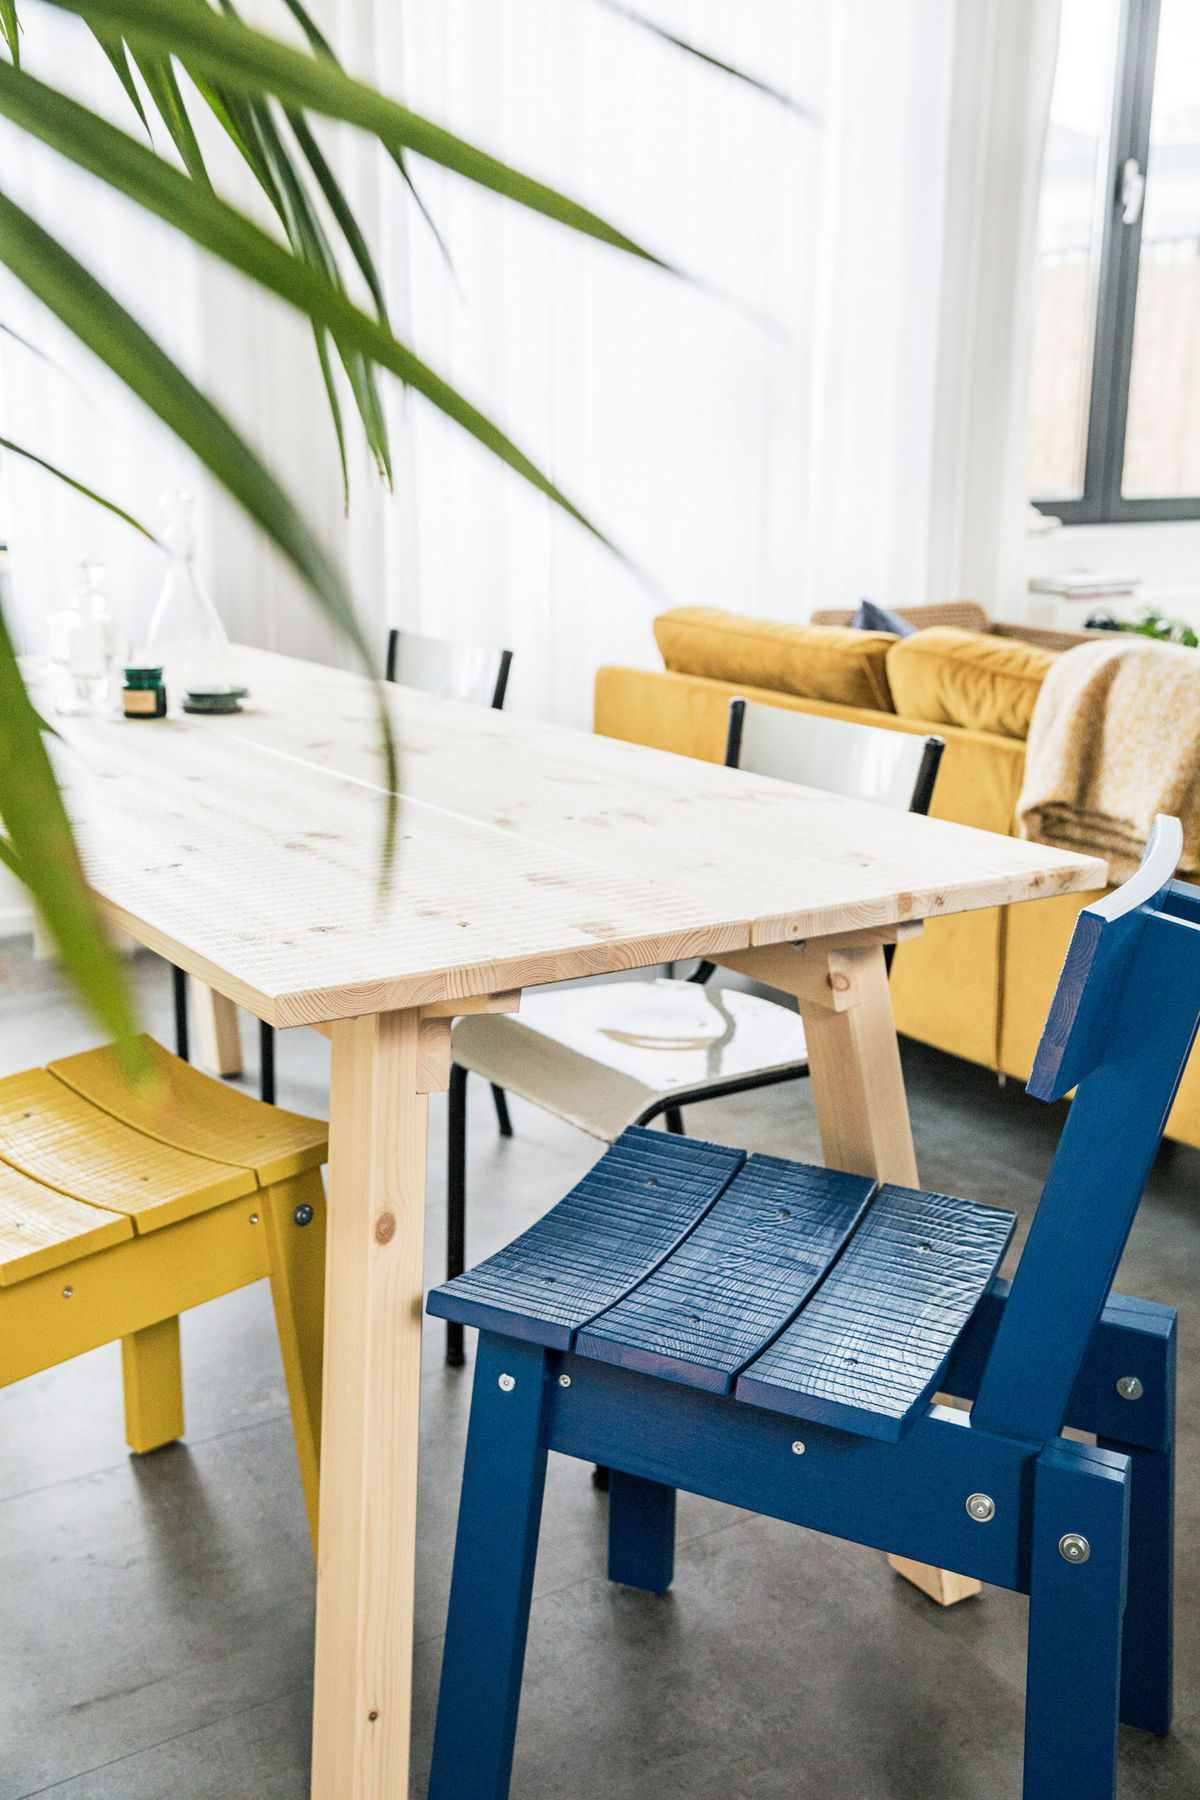 ikea industrial furniture. Via: Dezeen Ikea Industrial Furniture S